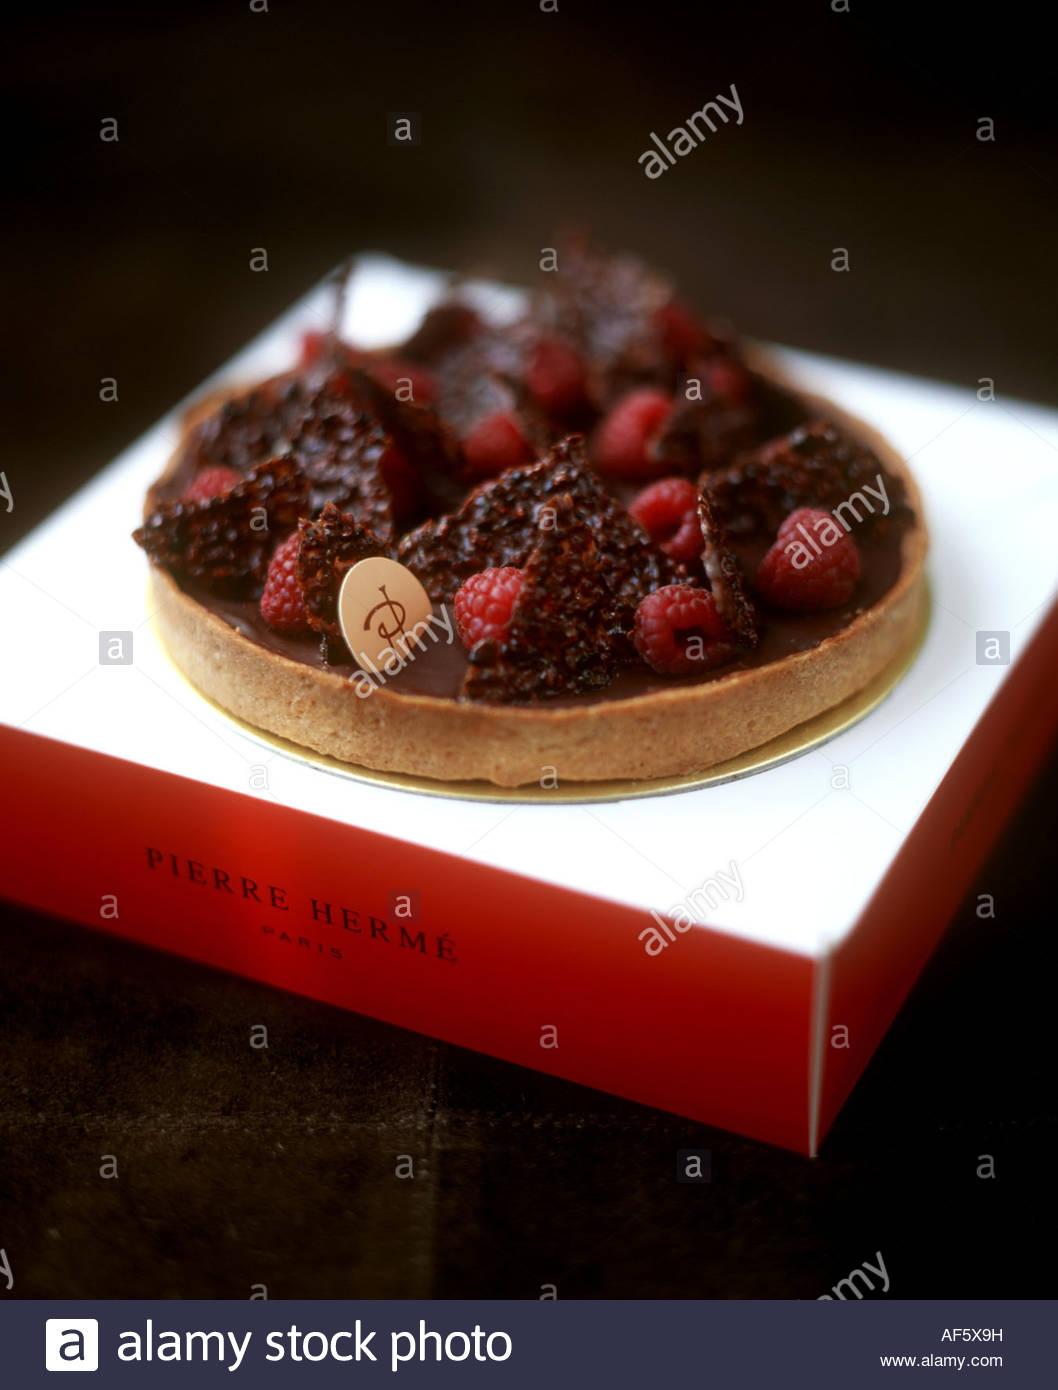 Chocolate and raspberry gateau by Pierre Herme, Paris Stock Photo